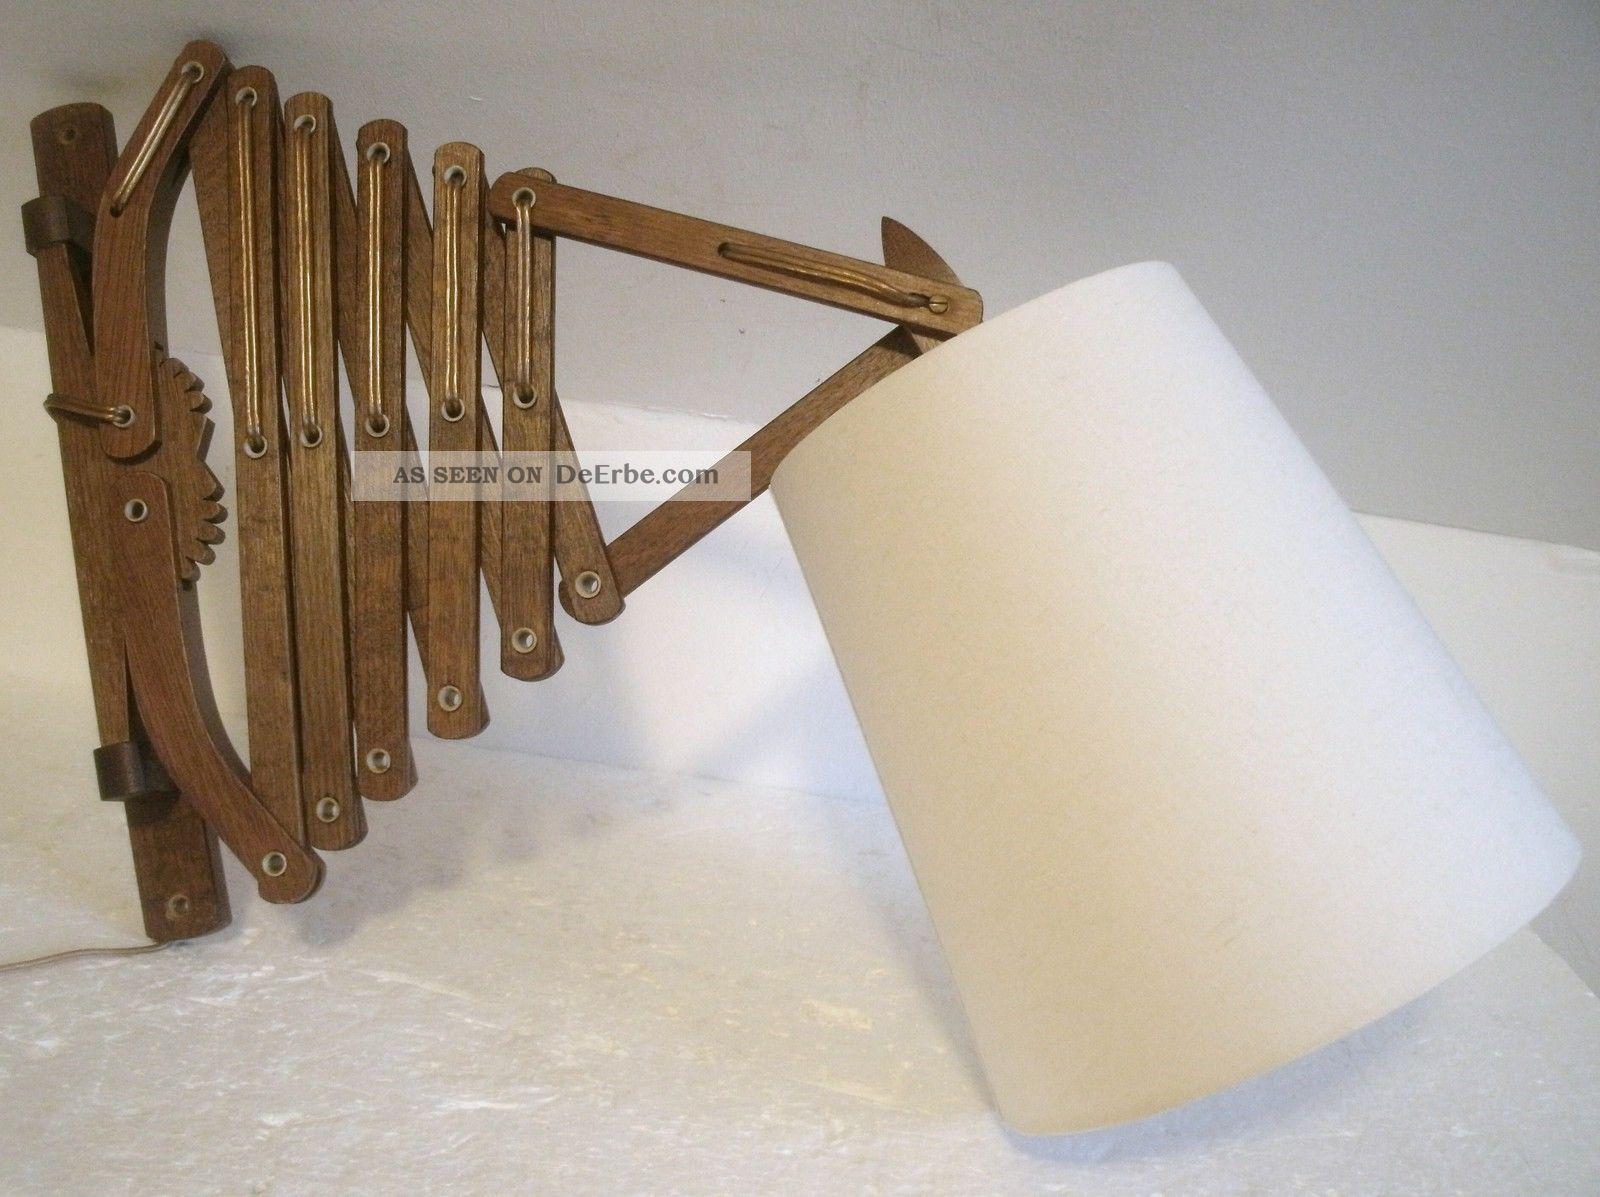 Möbel aus metall selber bauen: ideas about couch selber bauen on ...